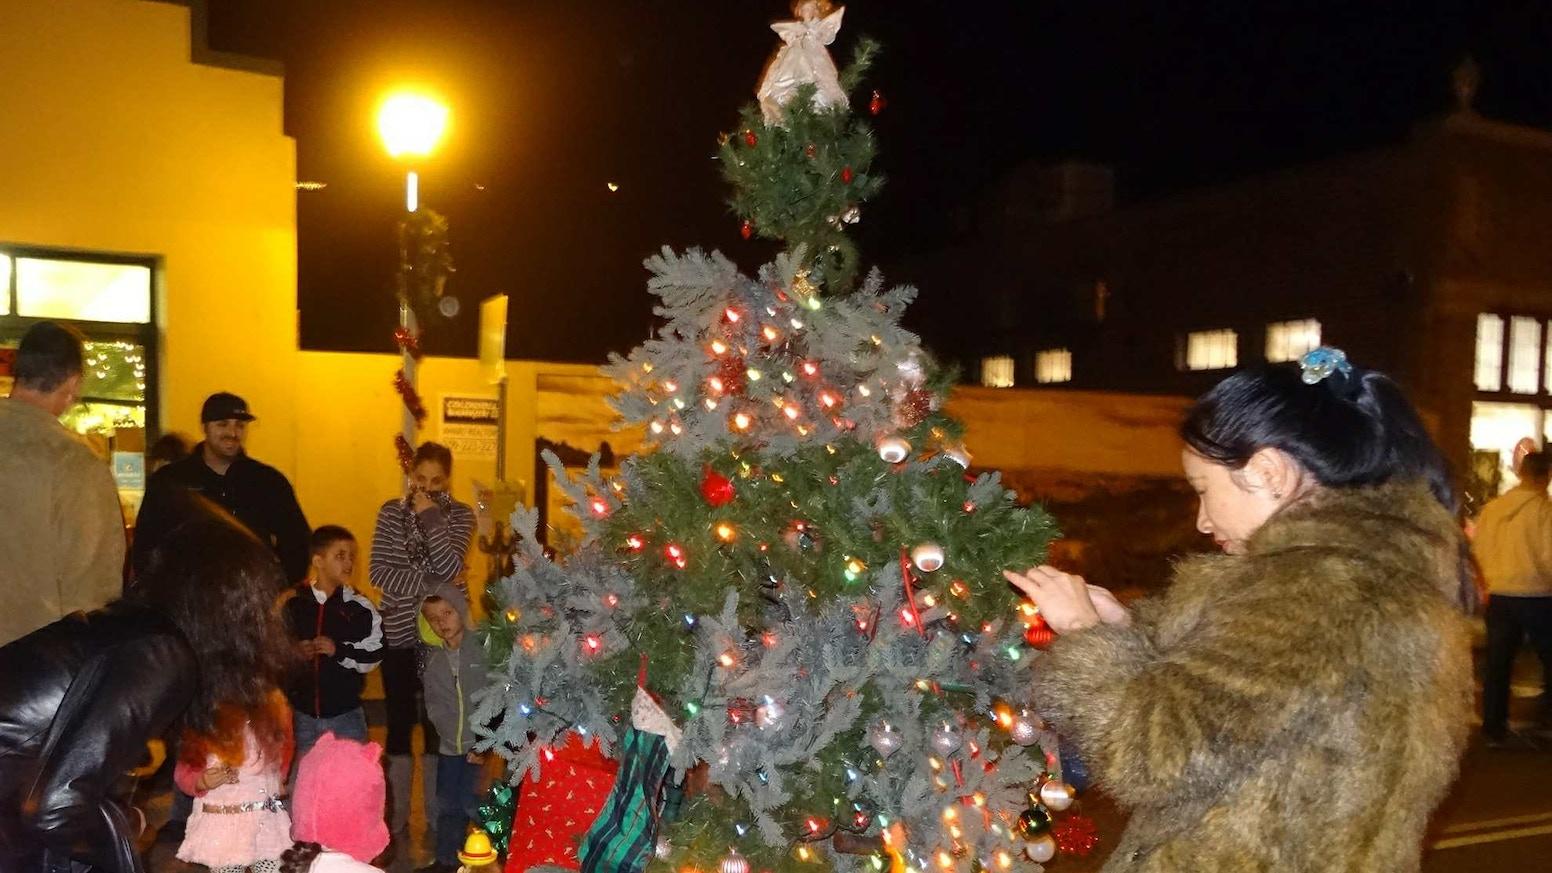 The Christmas Tree Hugger By James Telfer